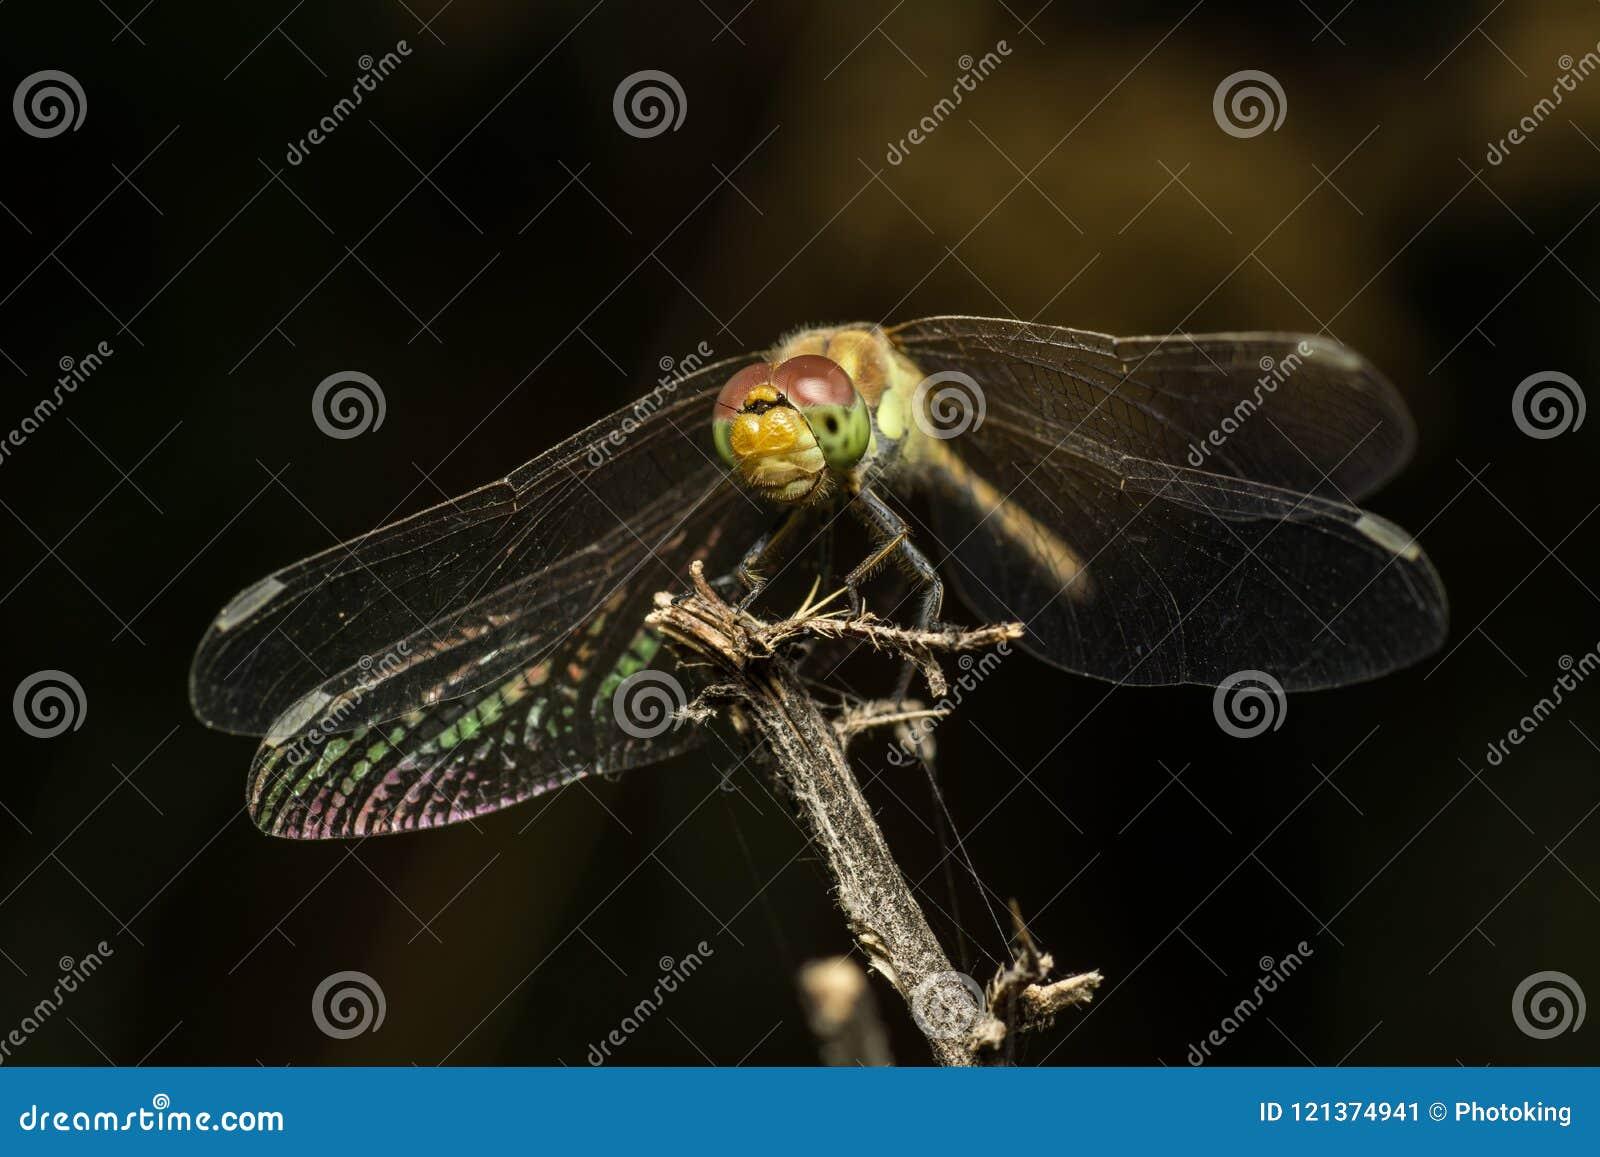 Dragonfly resting